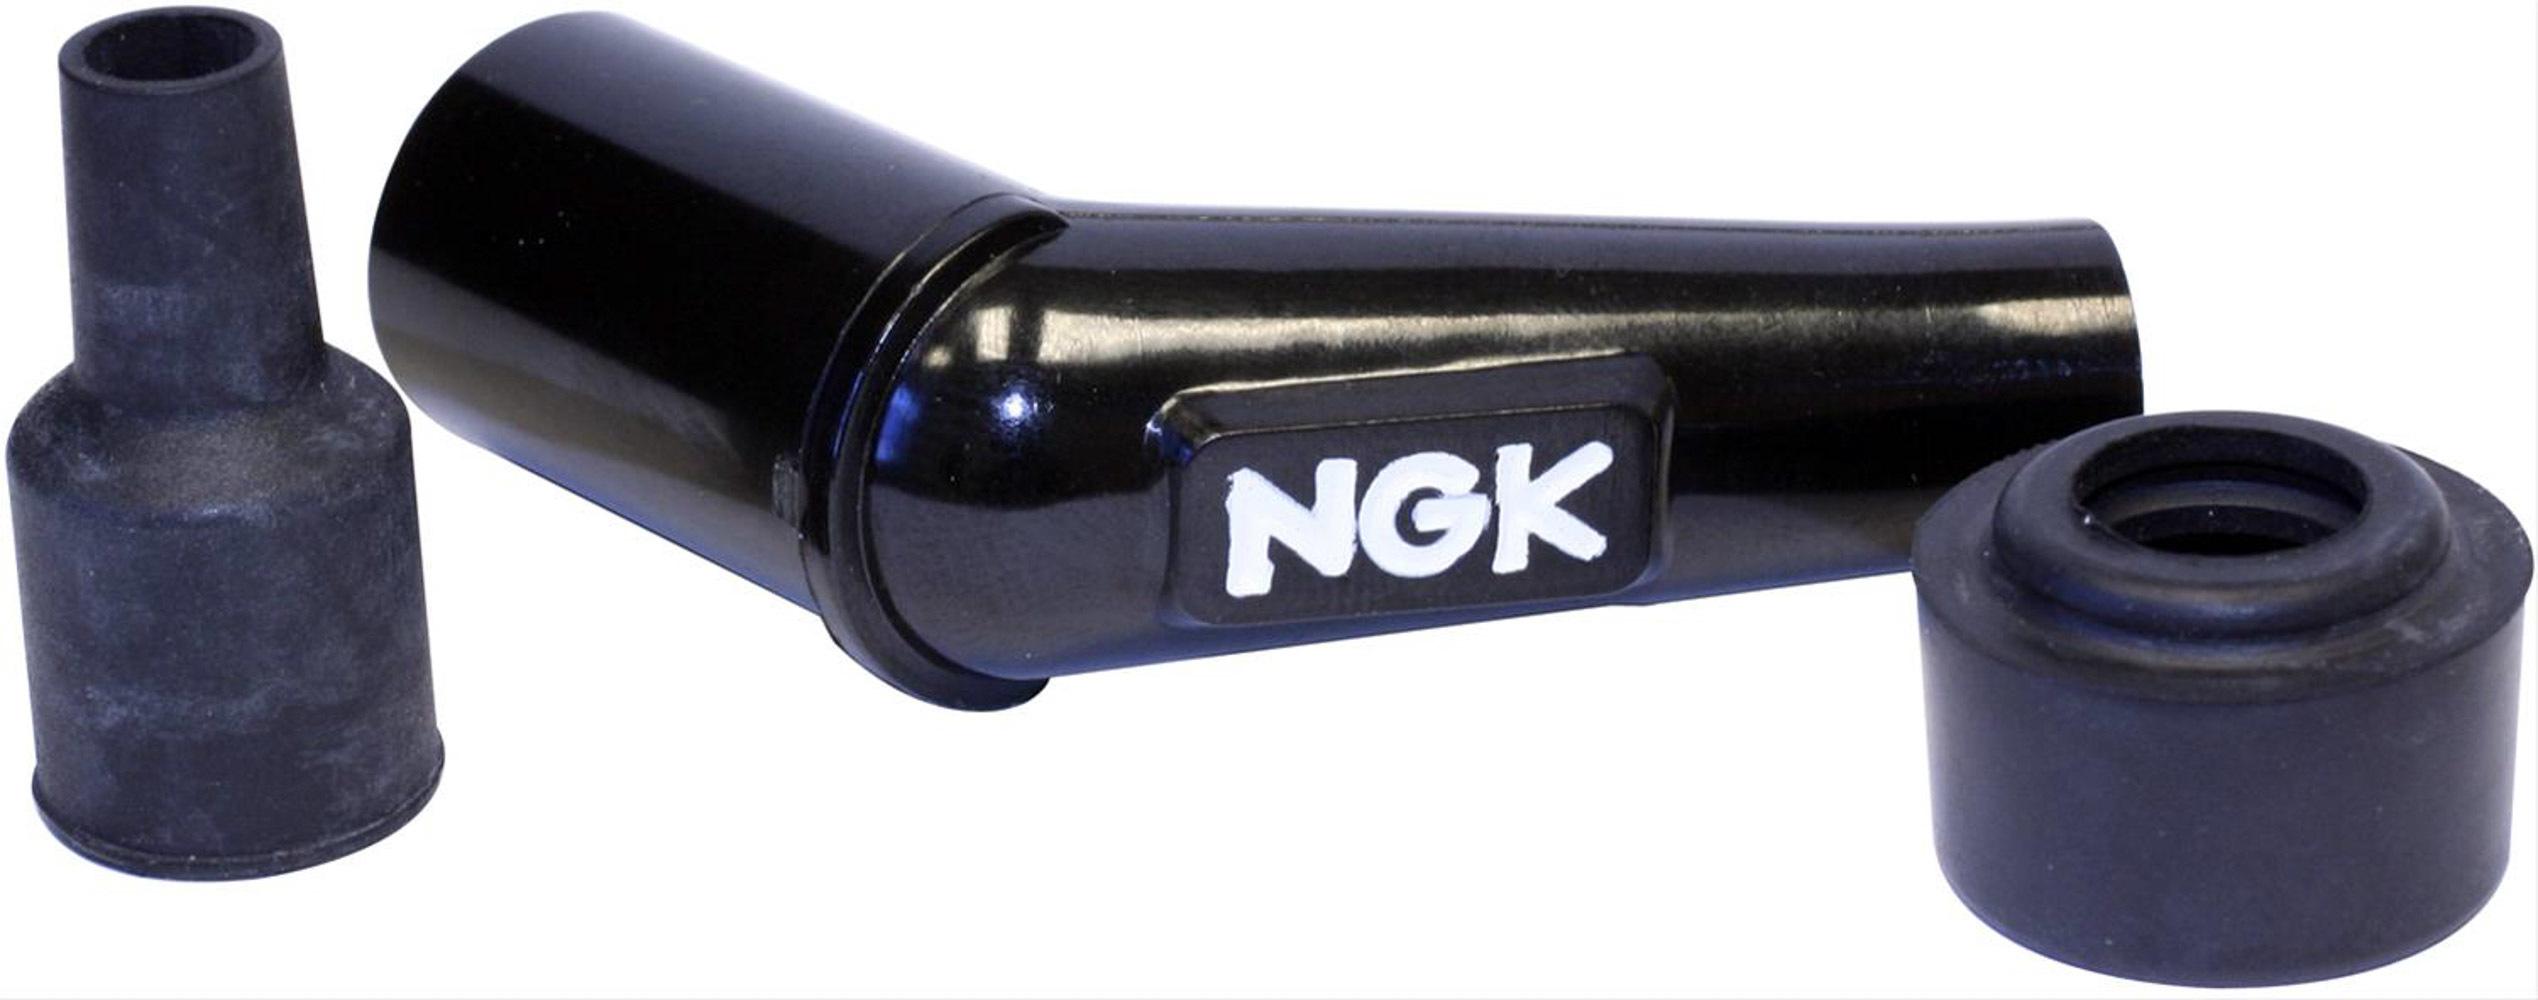 Ngk Spark Plug Cap 14mm 120-Degree Stock #8082